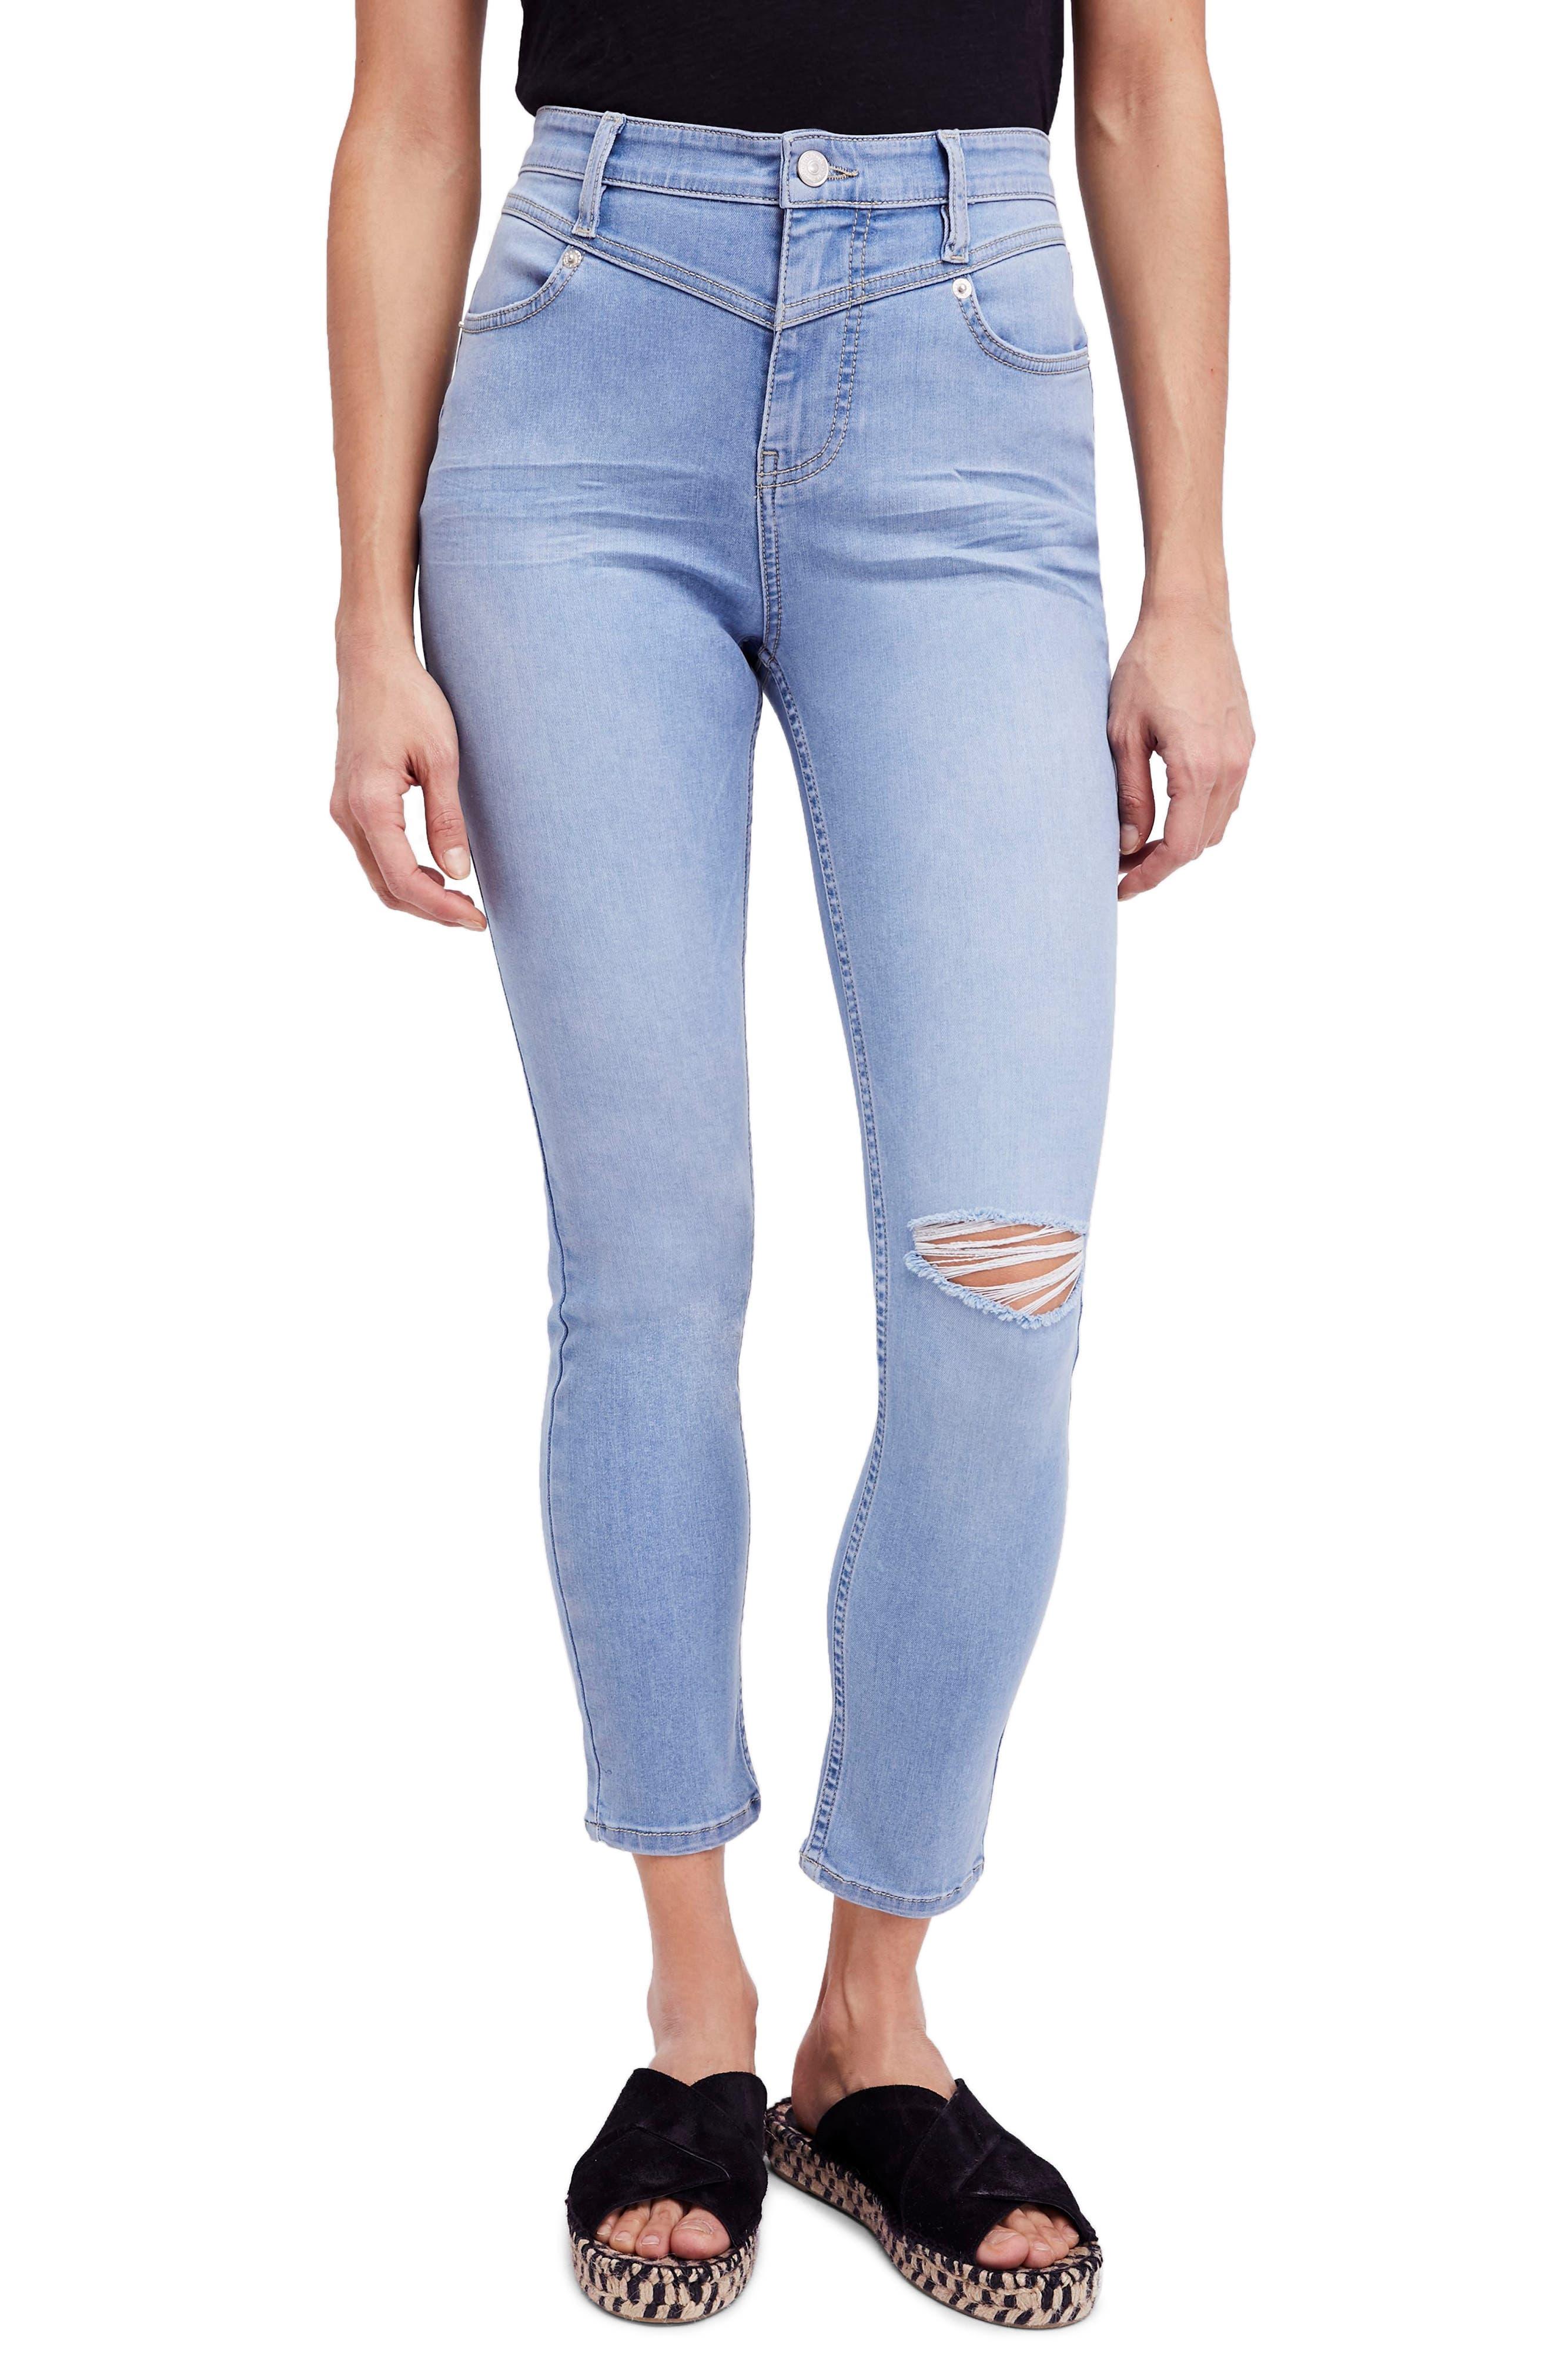 Mara Skinny Jeans,                             Main thumbnail 1, color,                             Blue